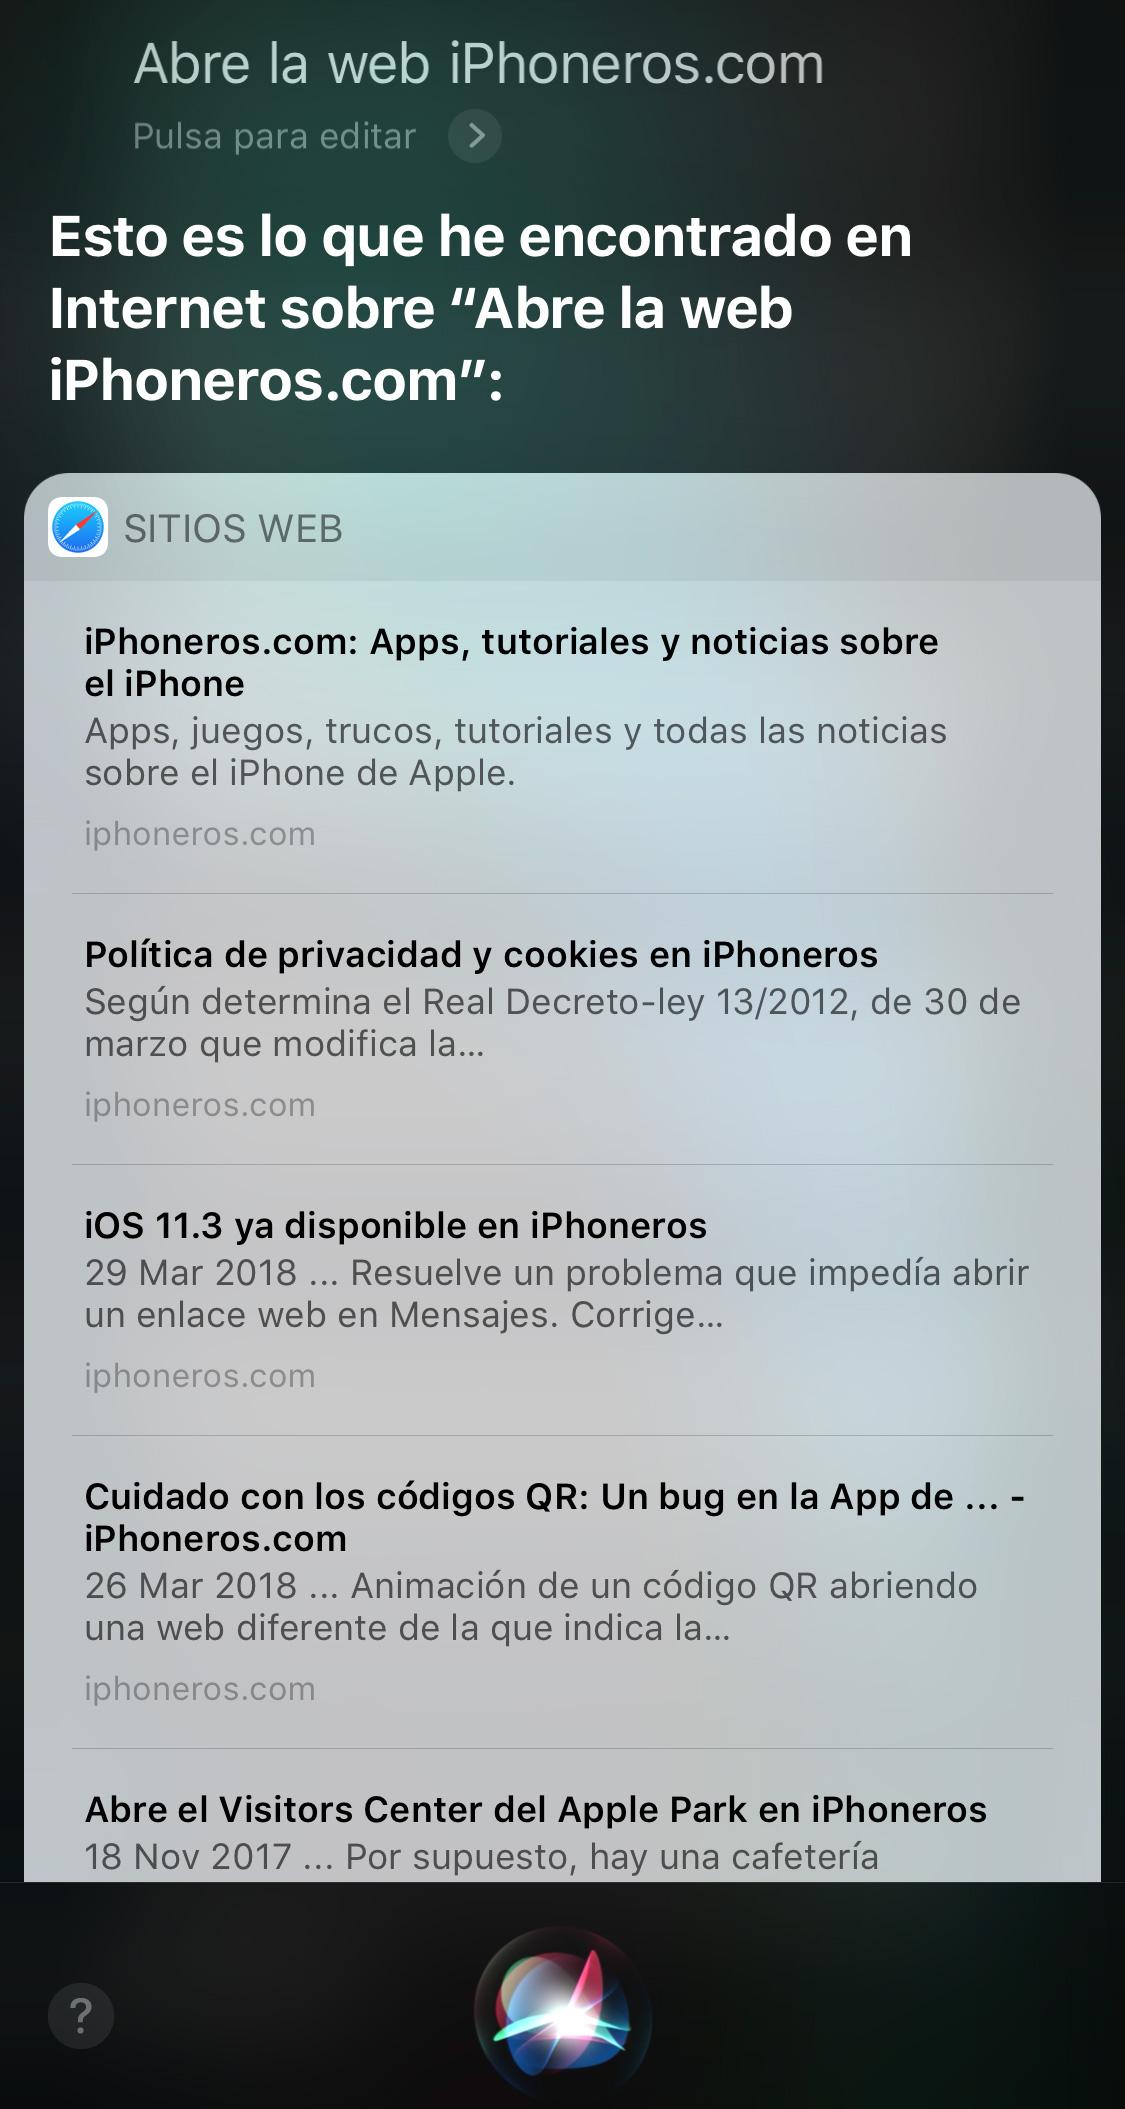 Siru no puede abrir iPhoneros.com